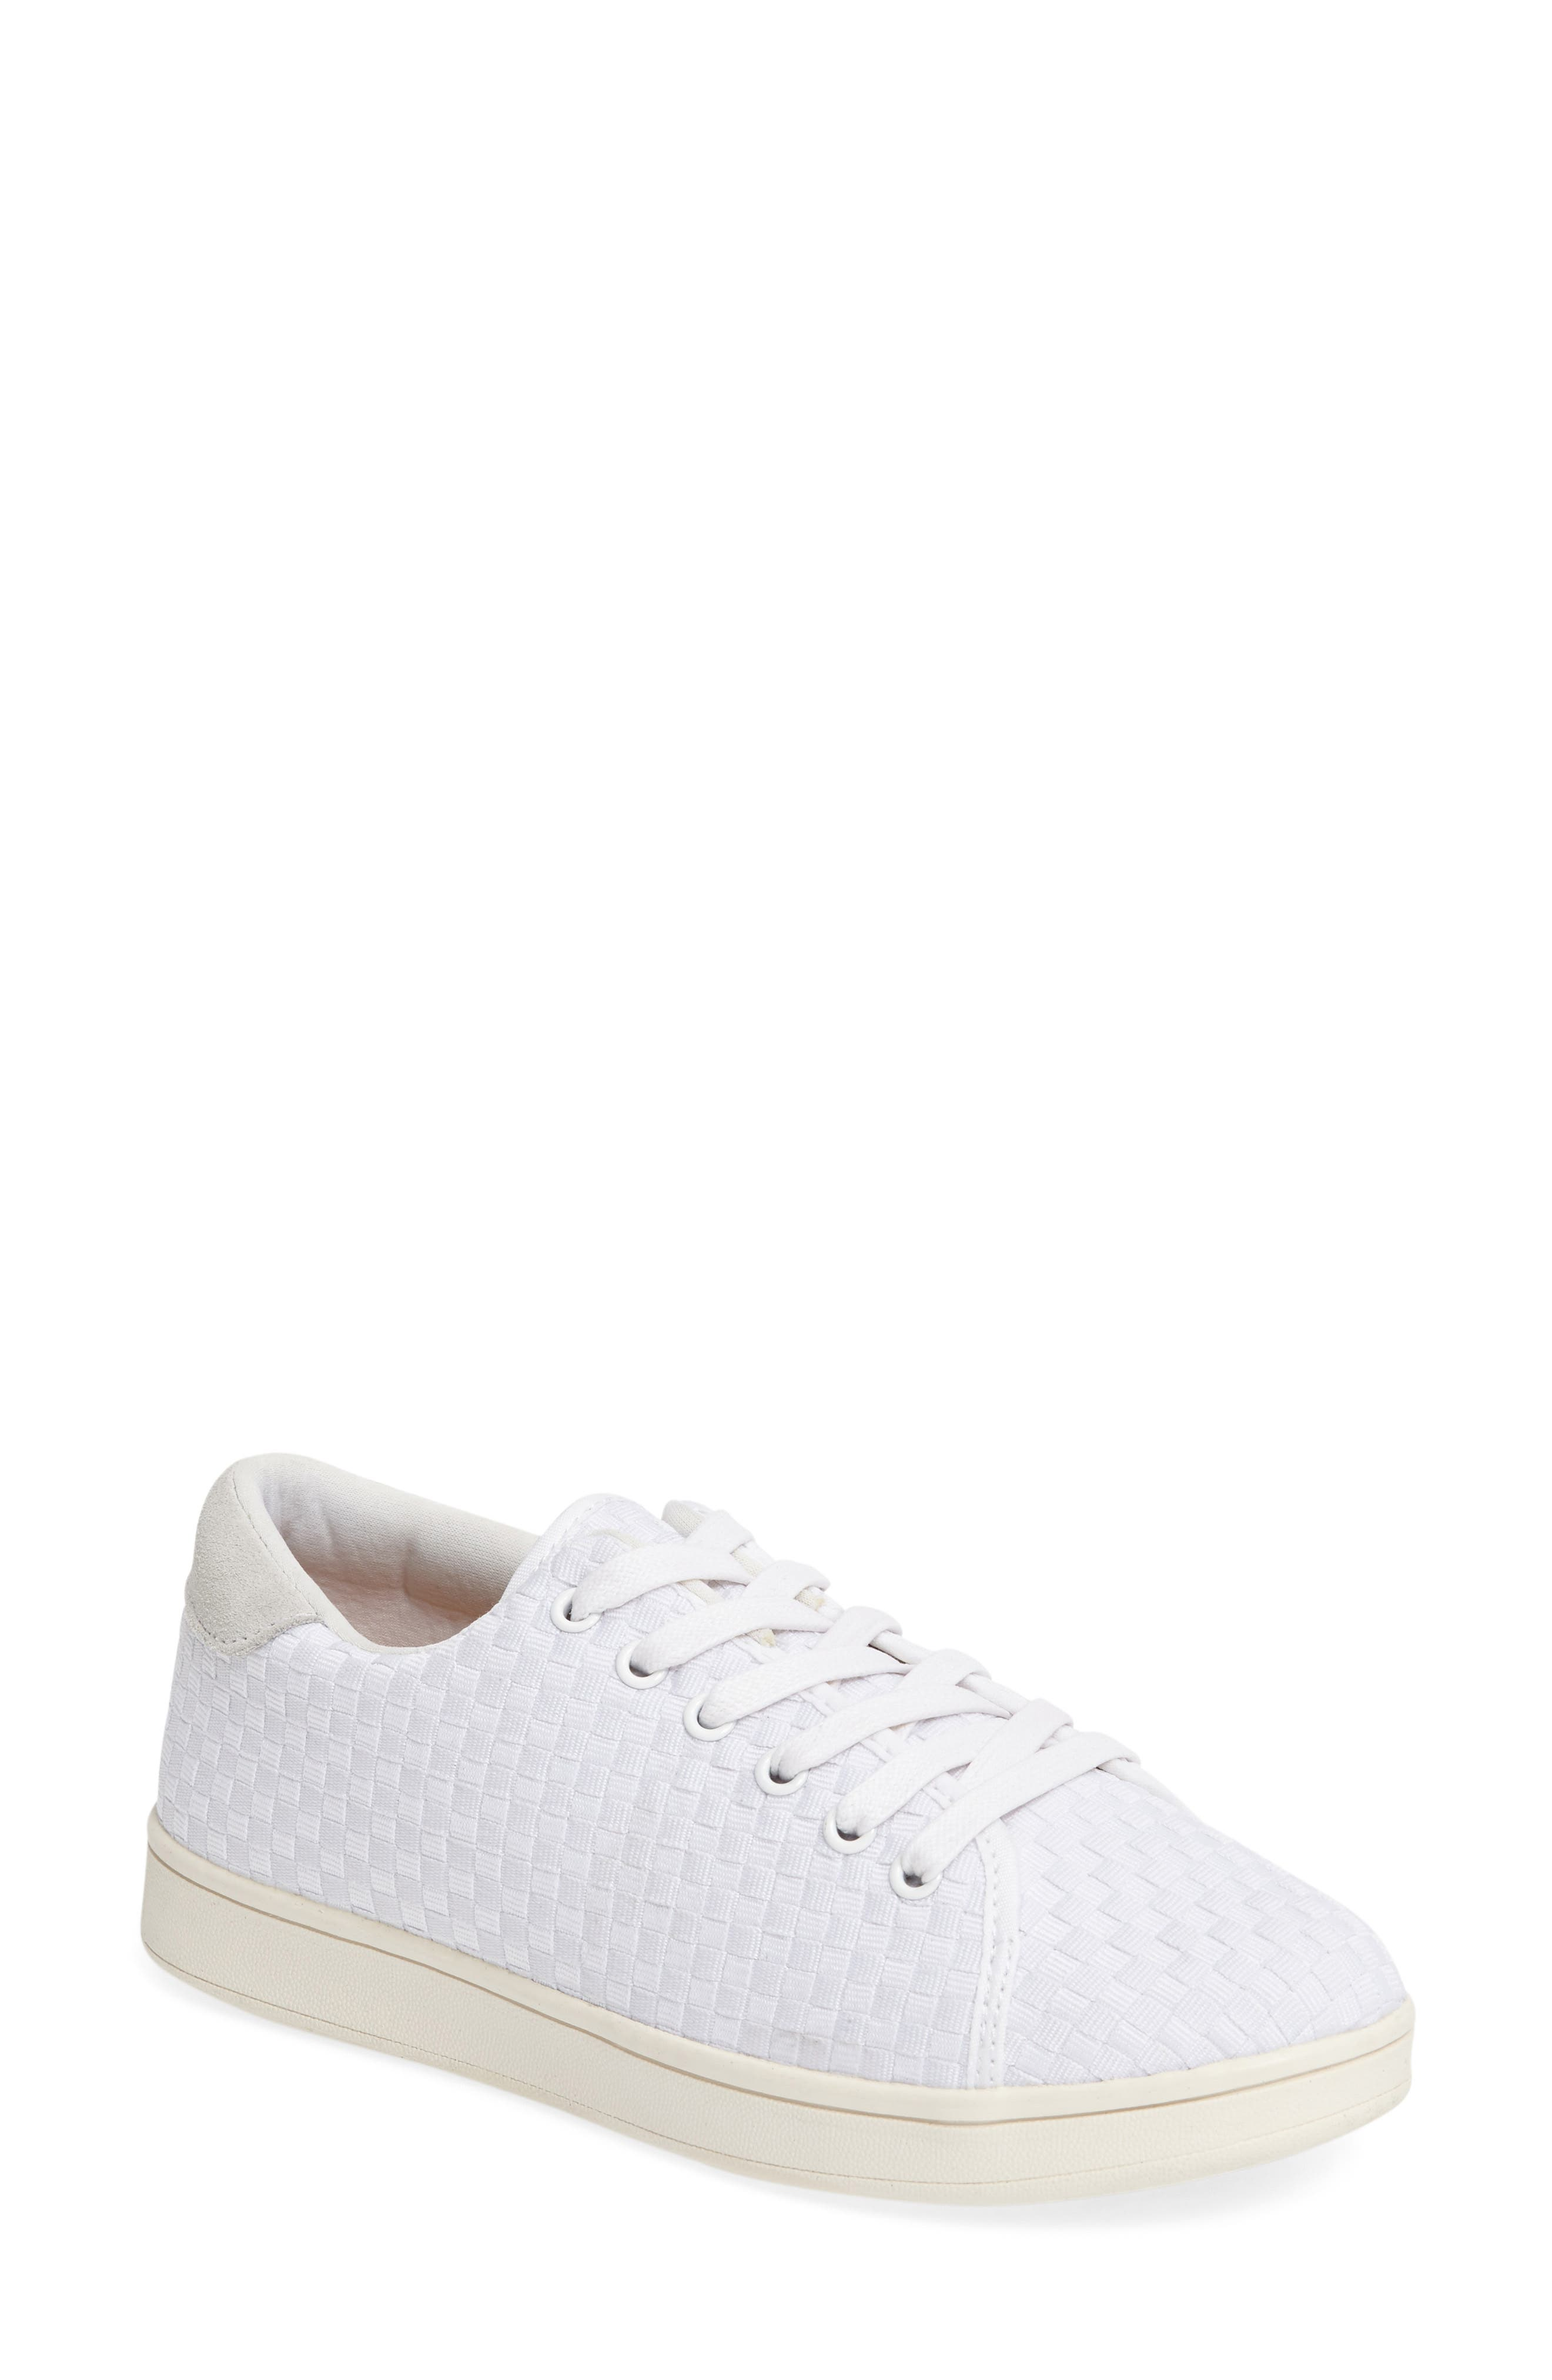 Daphne Sneaker,                         Main,                         color, 100